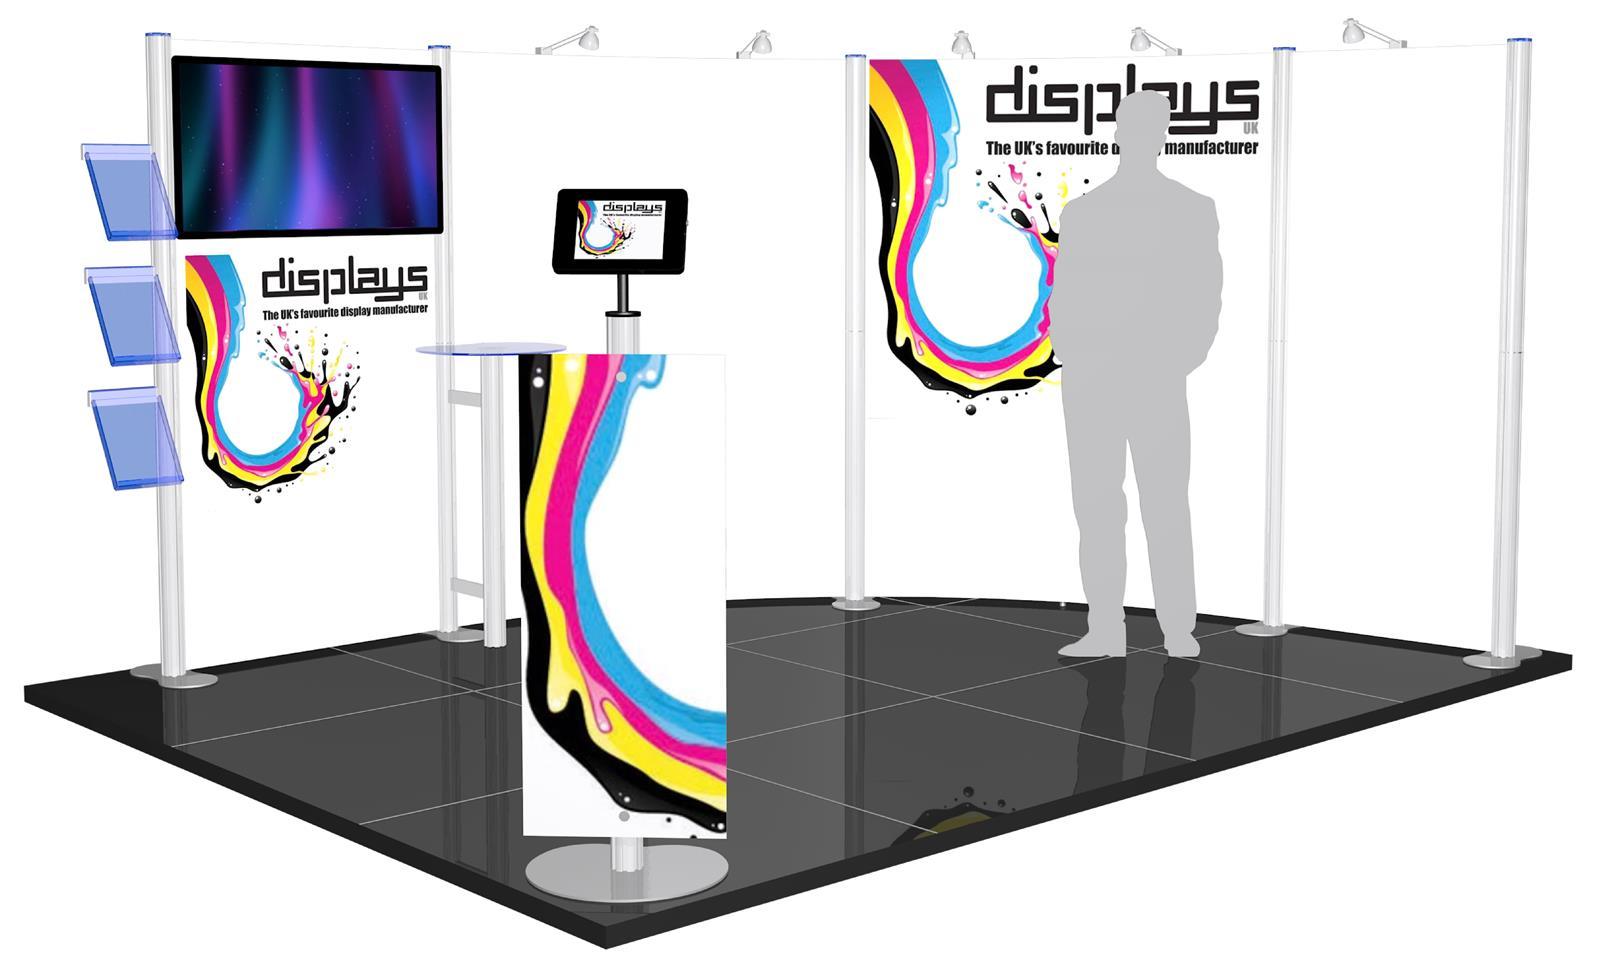 Centro 4m x 3m Modular Exhibition Stand - C4x3-2b